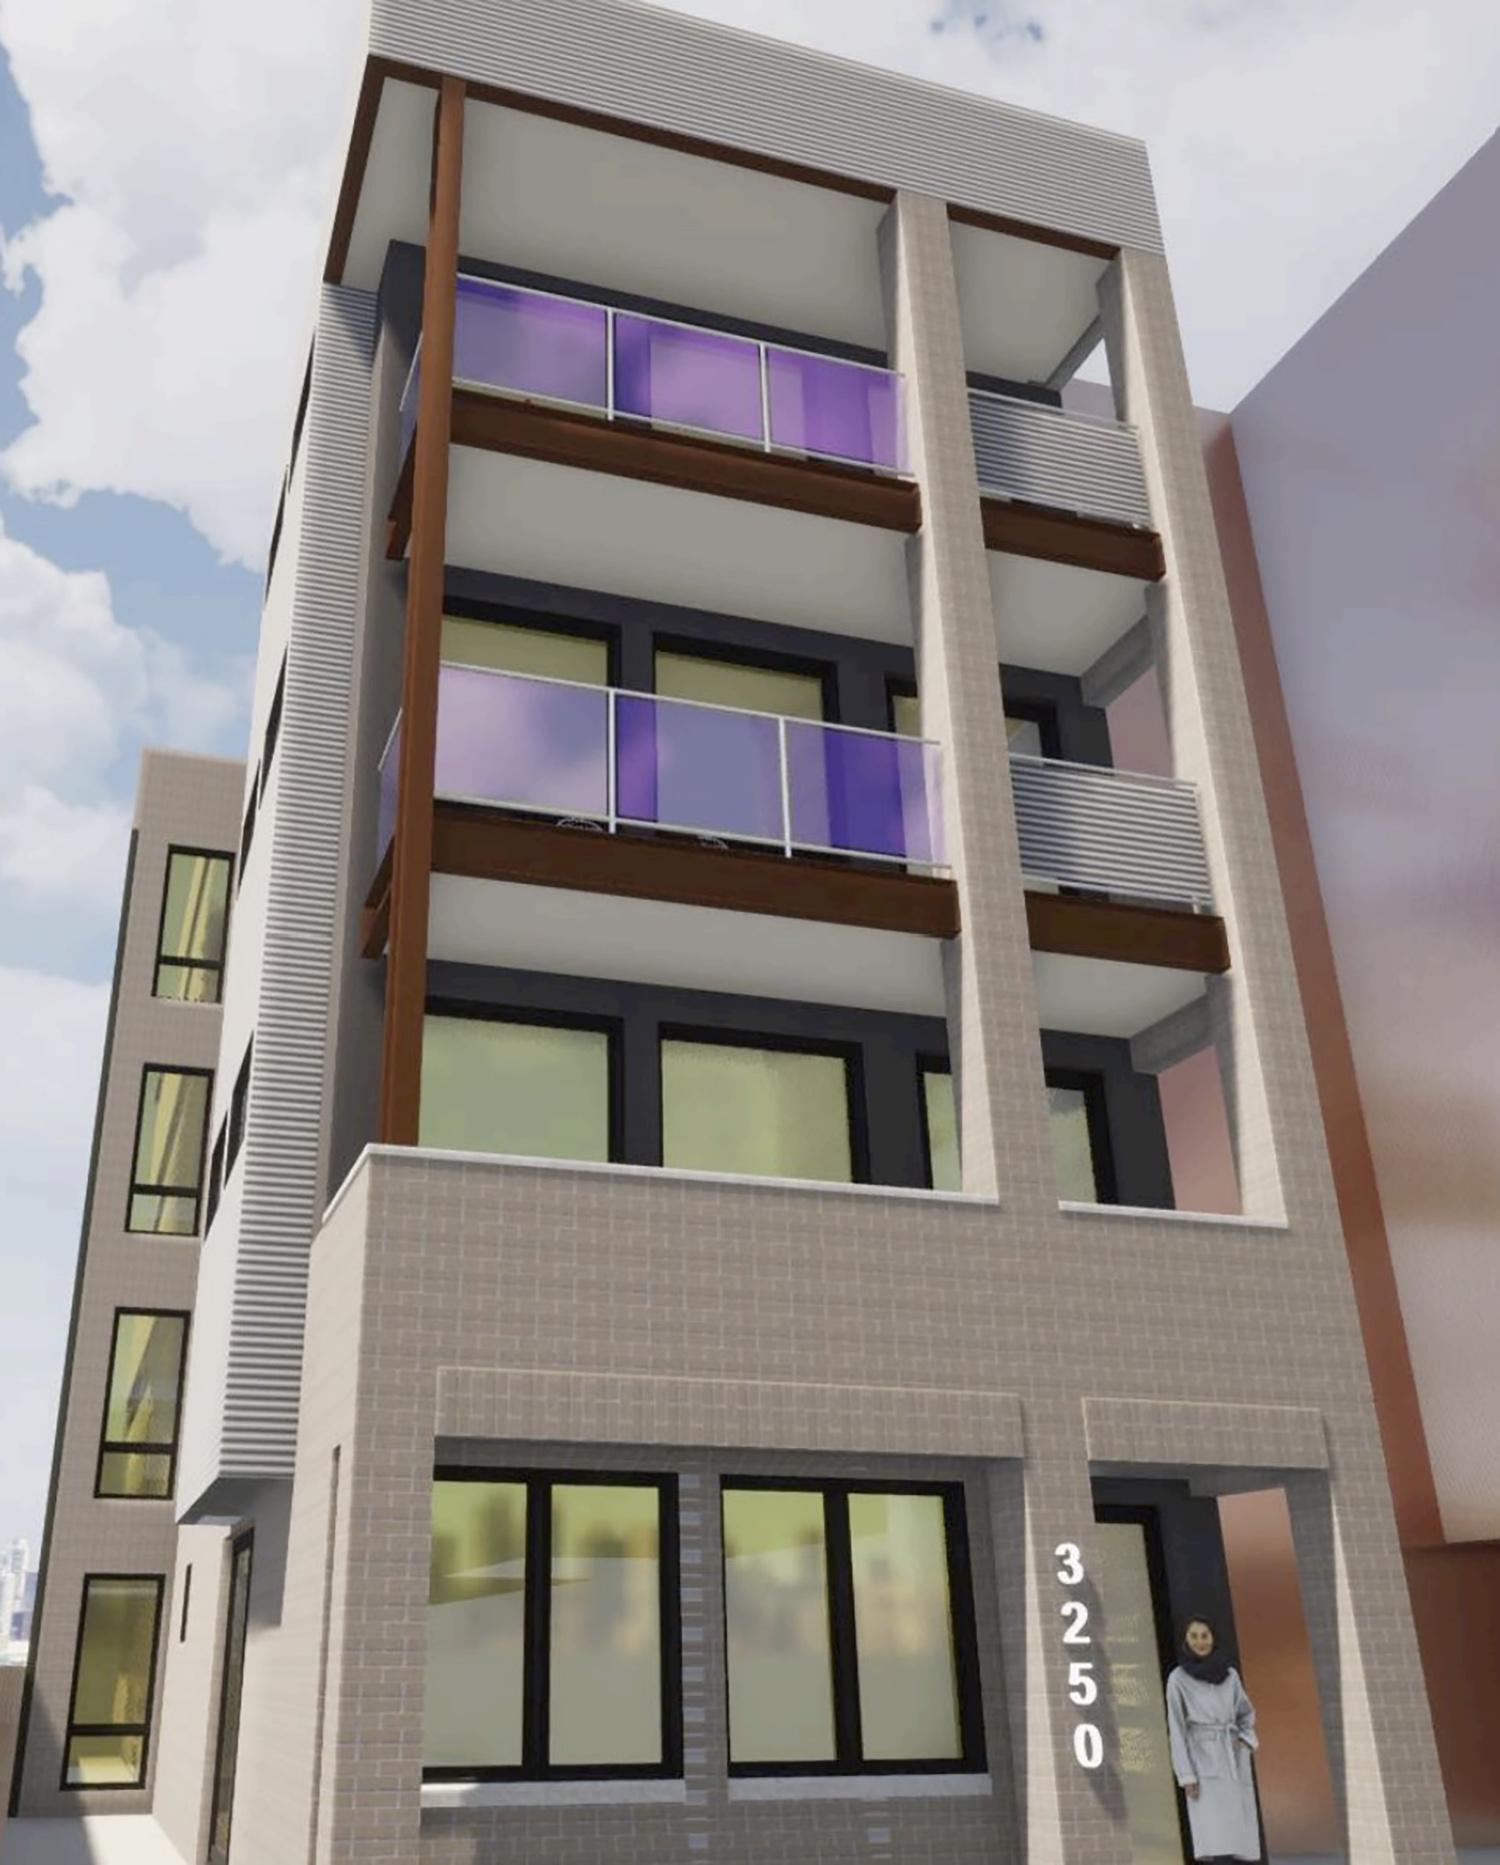 3250 N Clark Street. Rendering by Stoneberg + Gross Architects